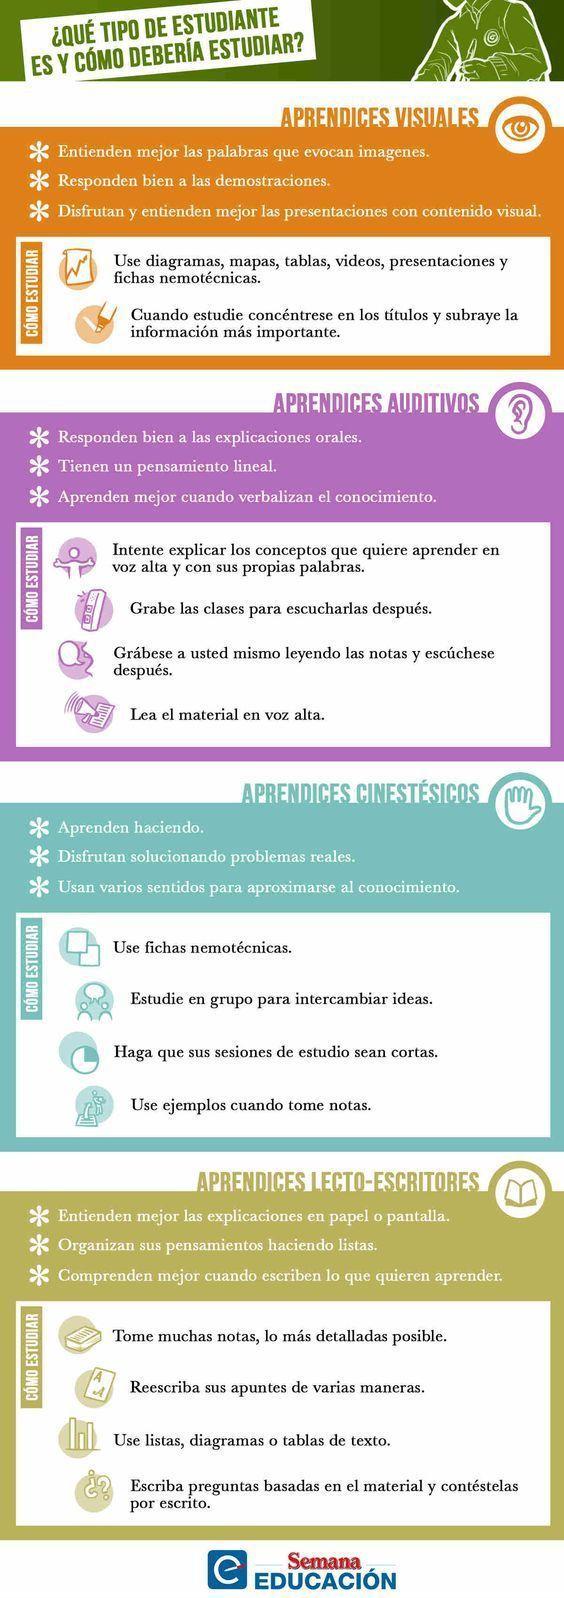 EstudiantesEstilosAprendizaje-Infografía-BlogGesvin